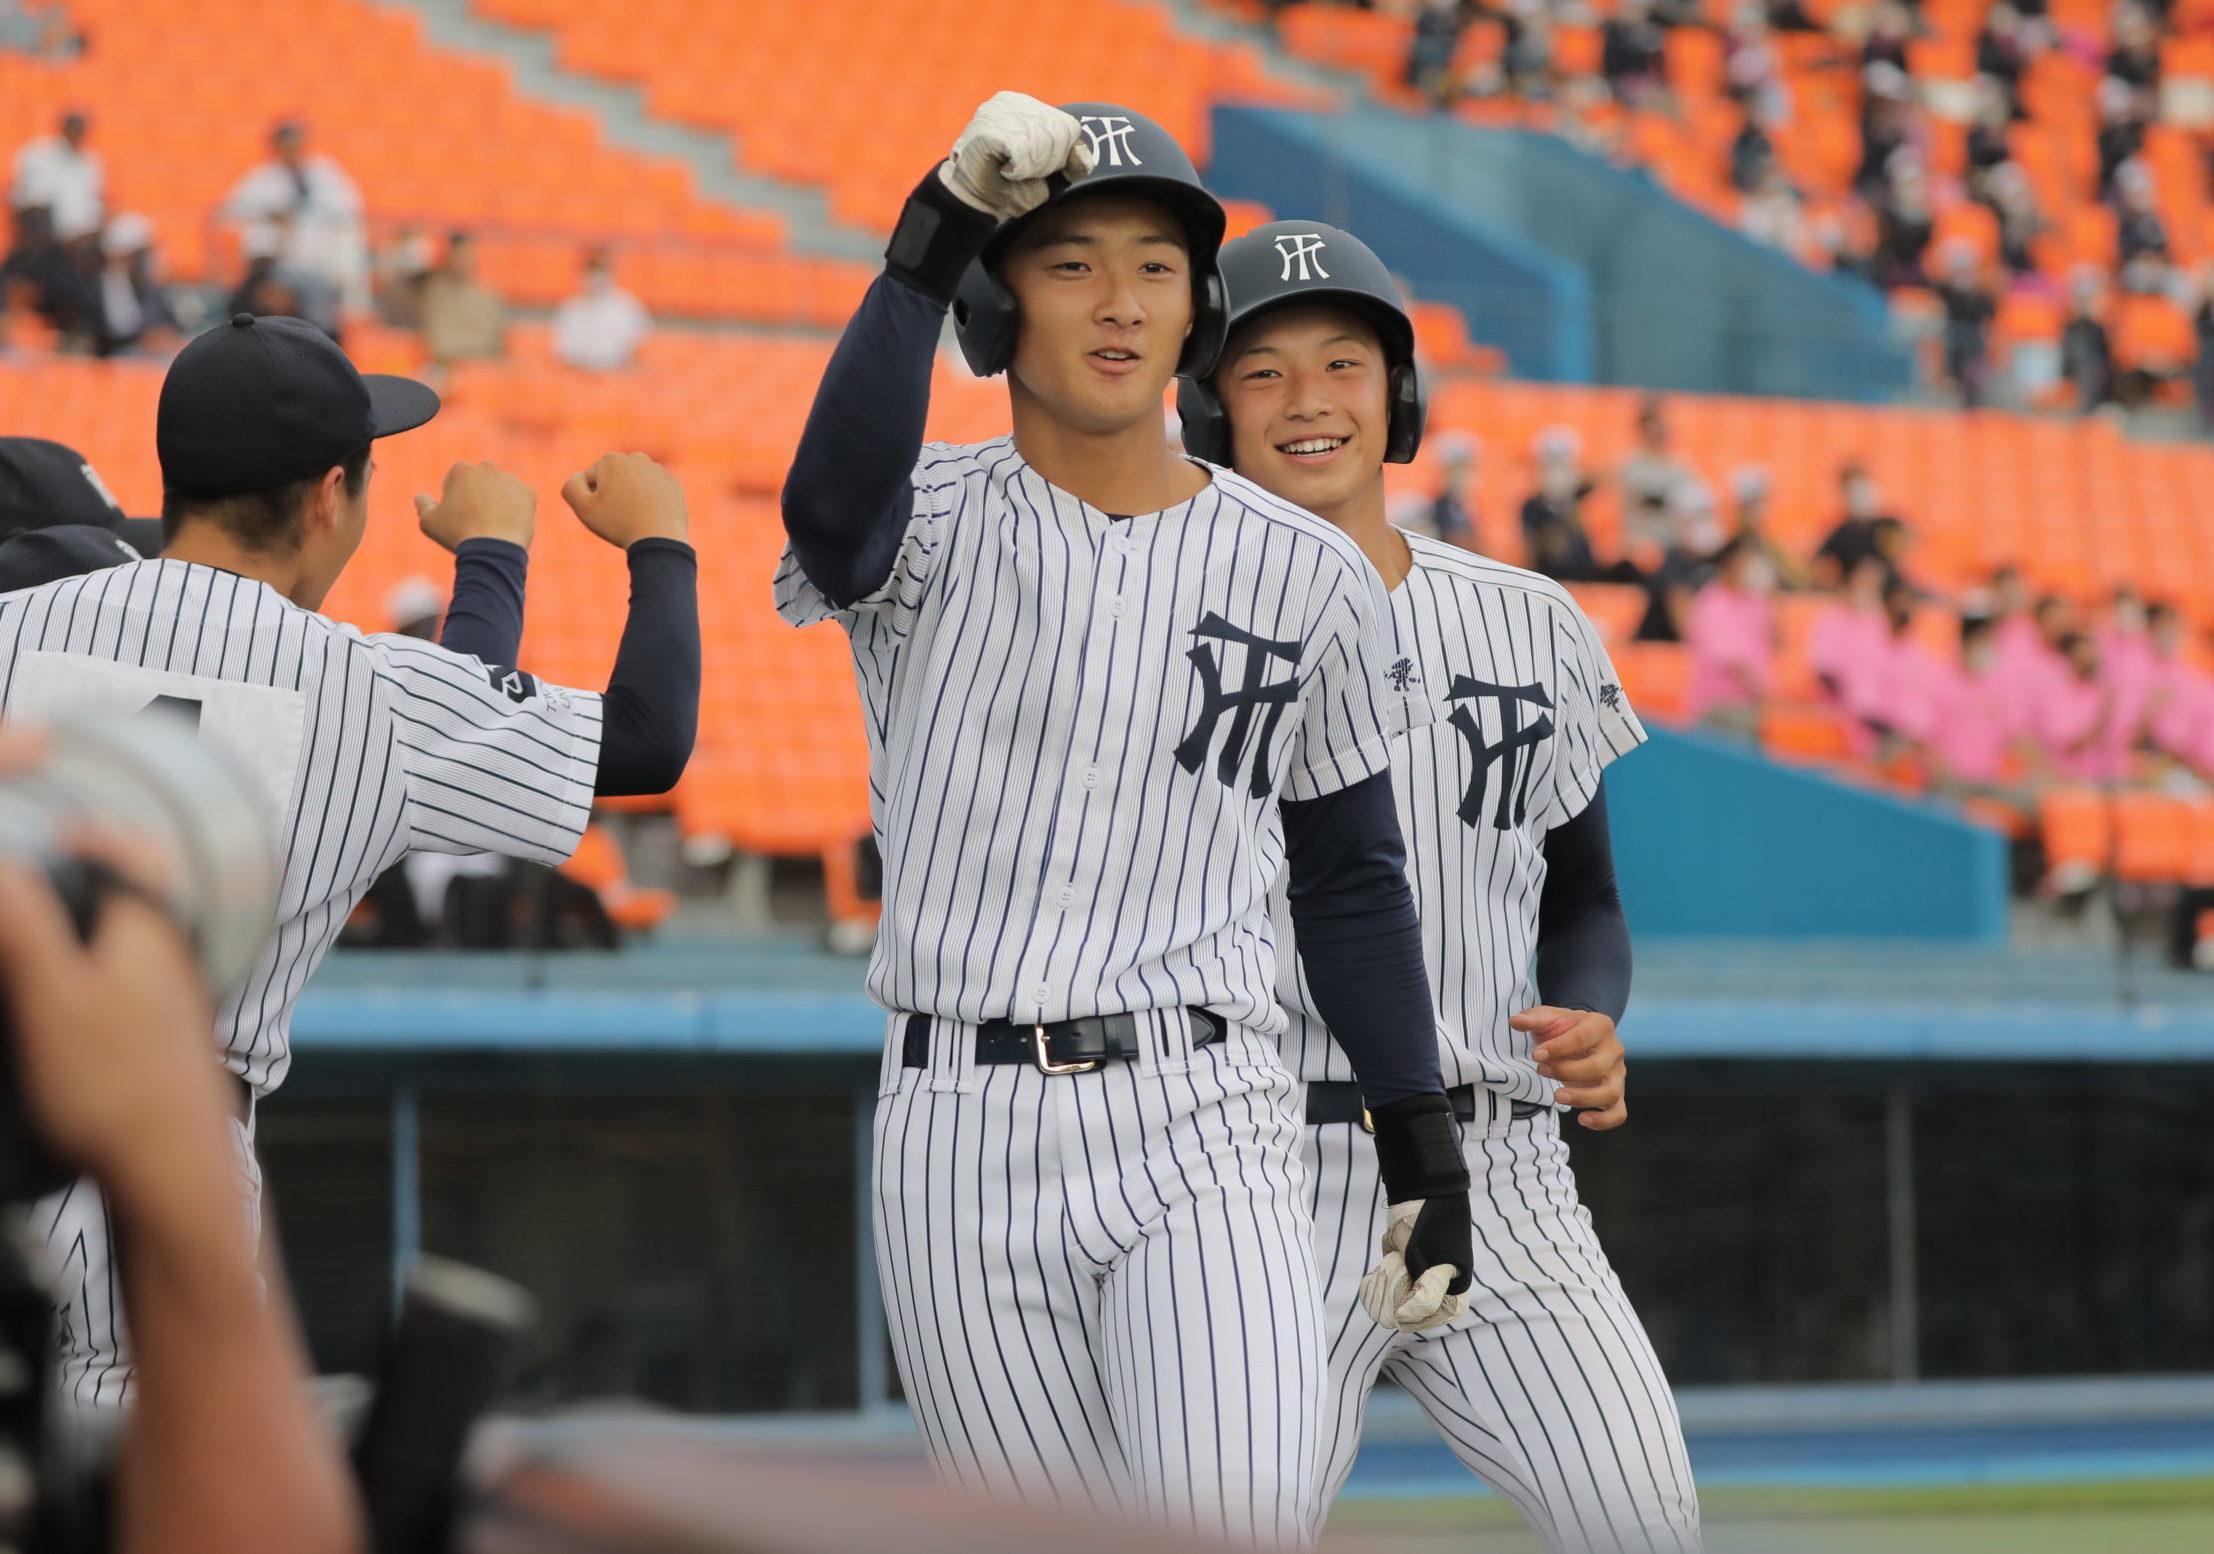 「2020年夏 大会レポート  常葉大菊川」 地区5位から準優勝 #常葉大菊川